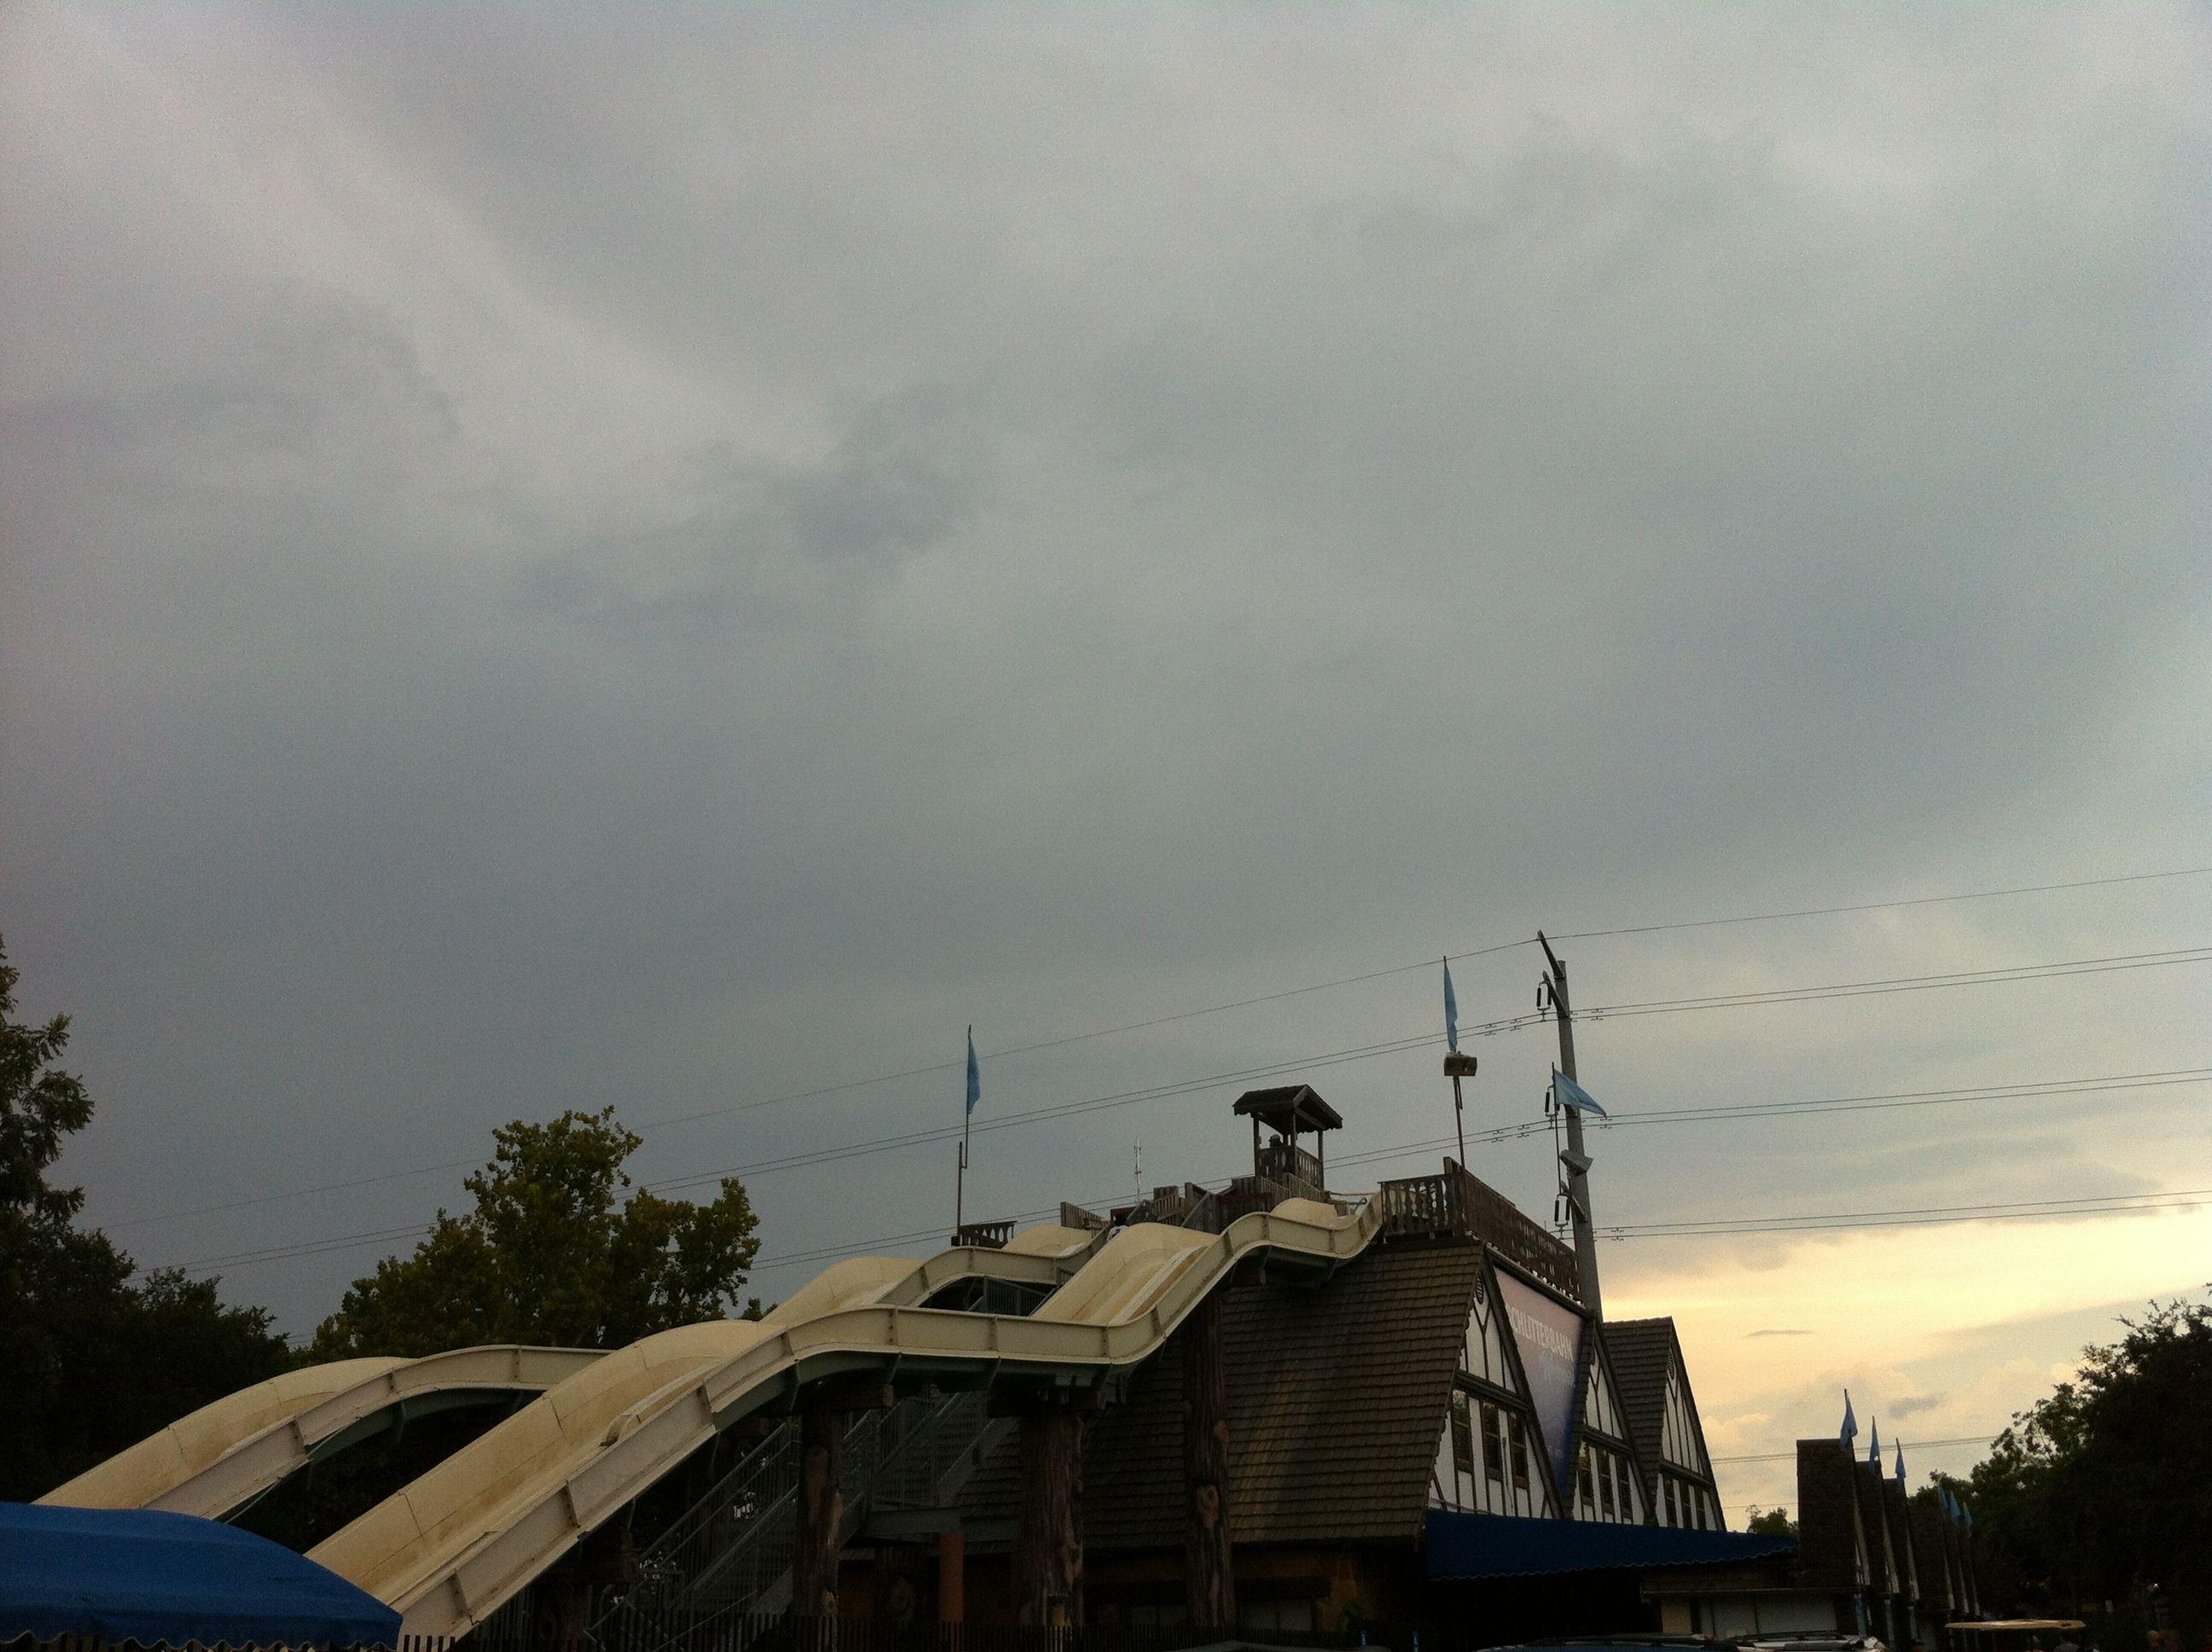 rain clouds won't get me down!